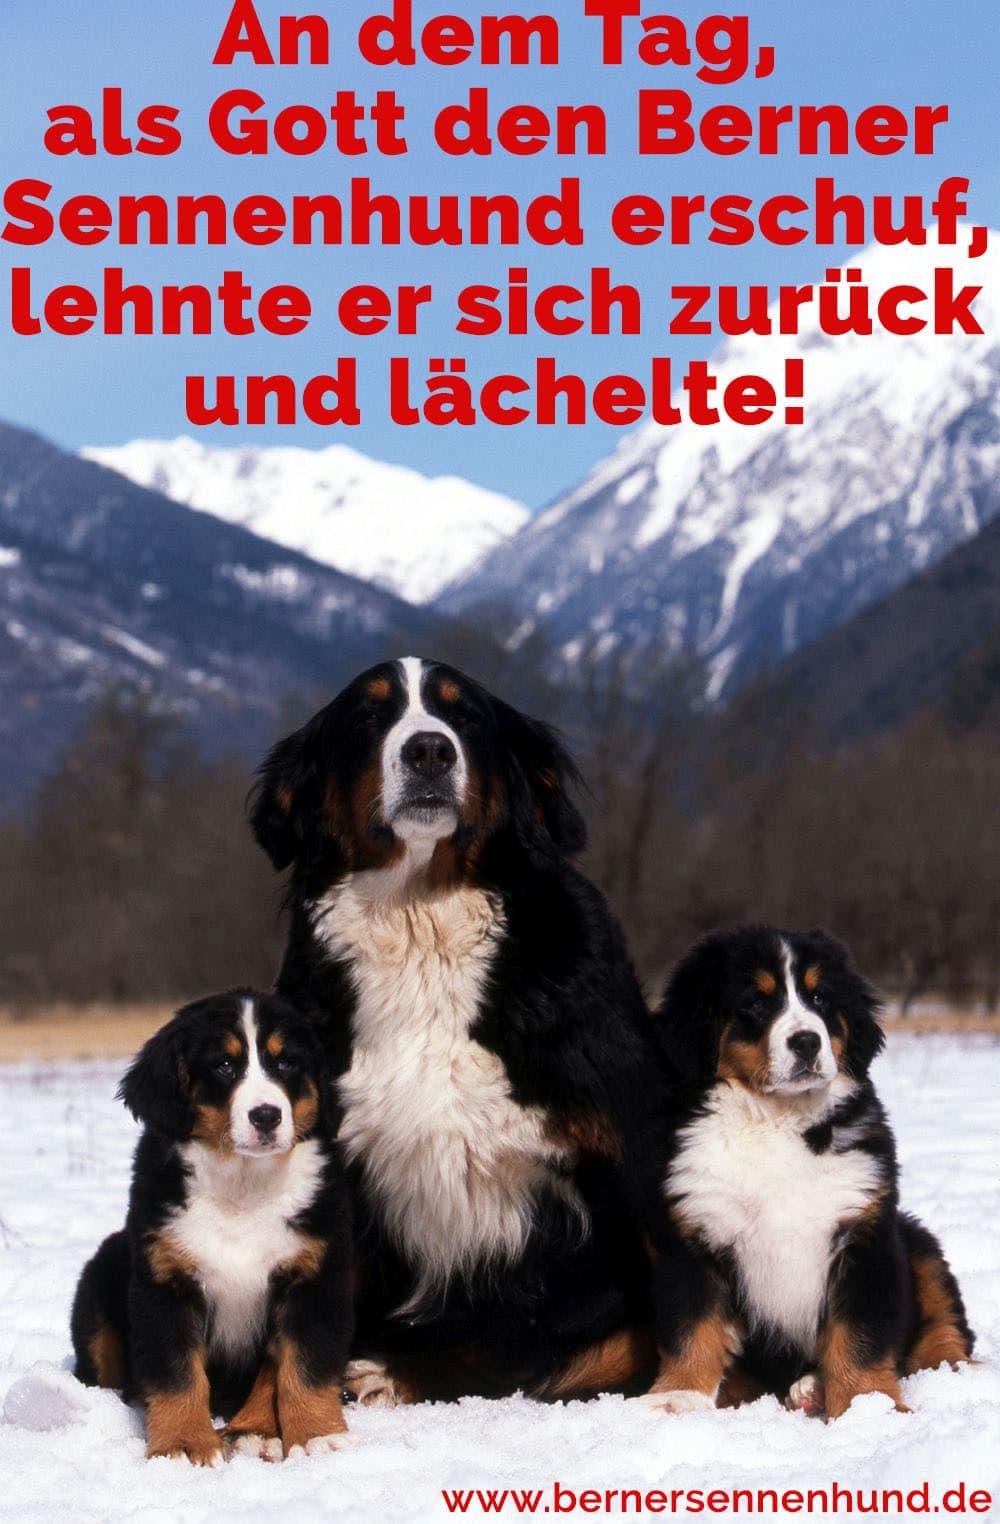 Drei Berner Sennenhunde in den Bergen